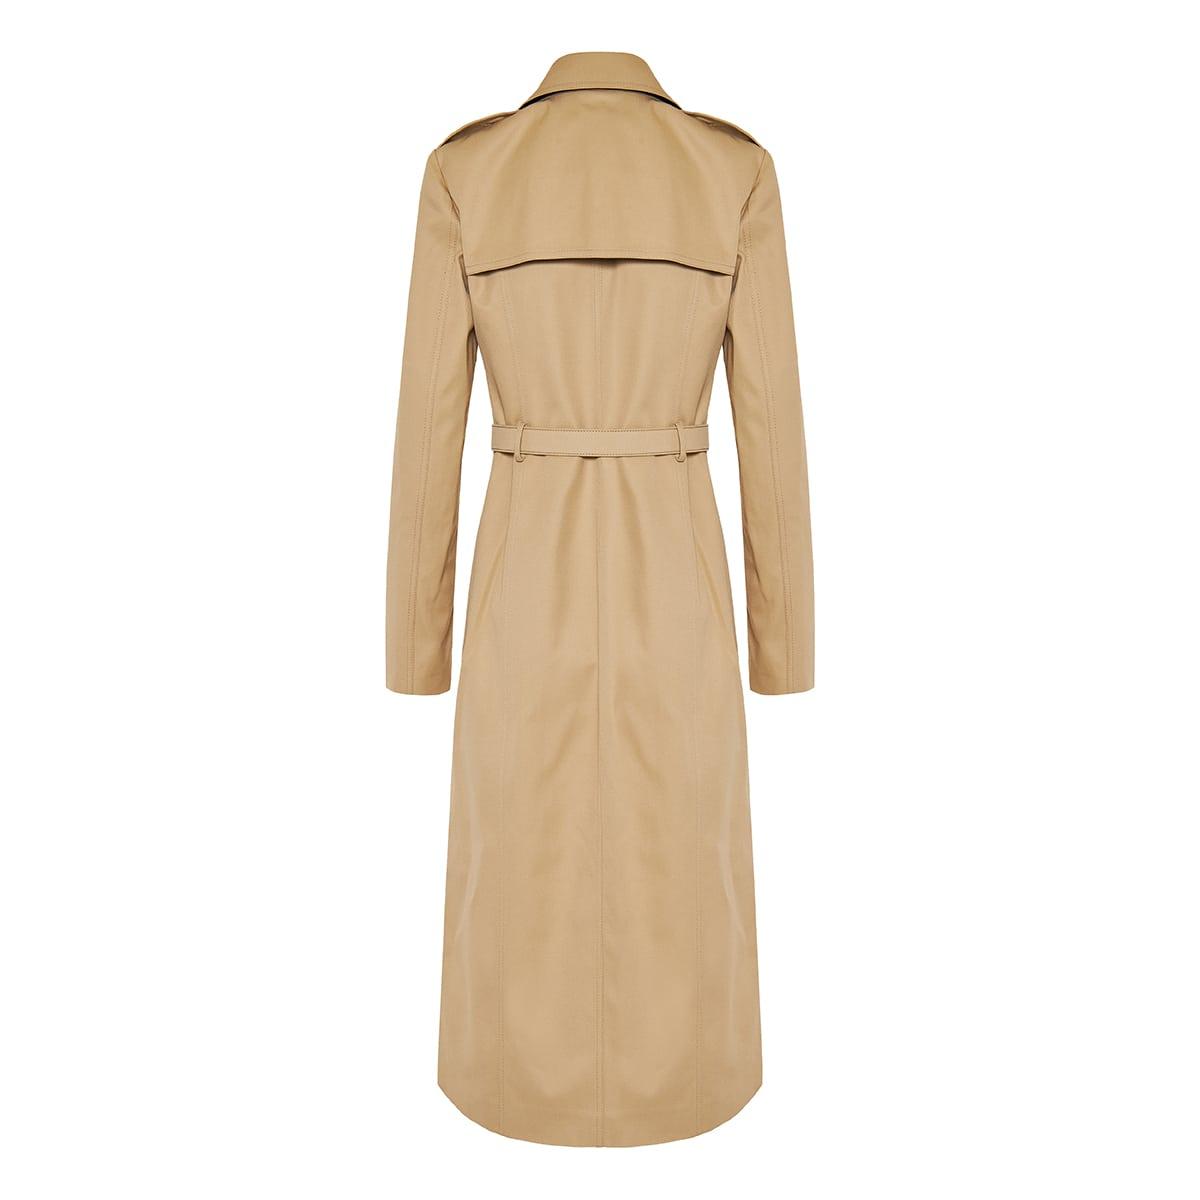 Vlogo belted trench coat